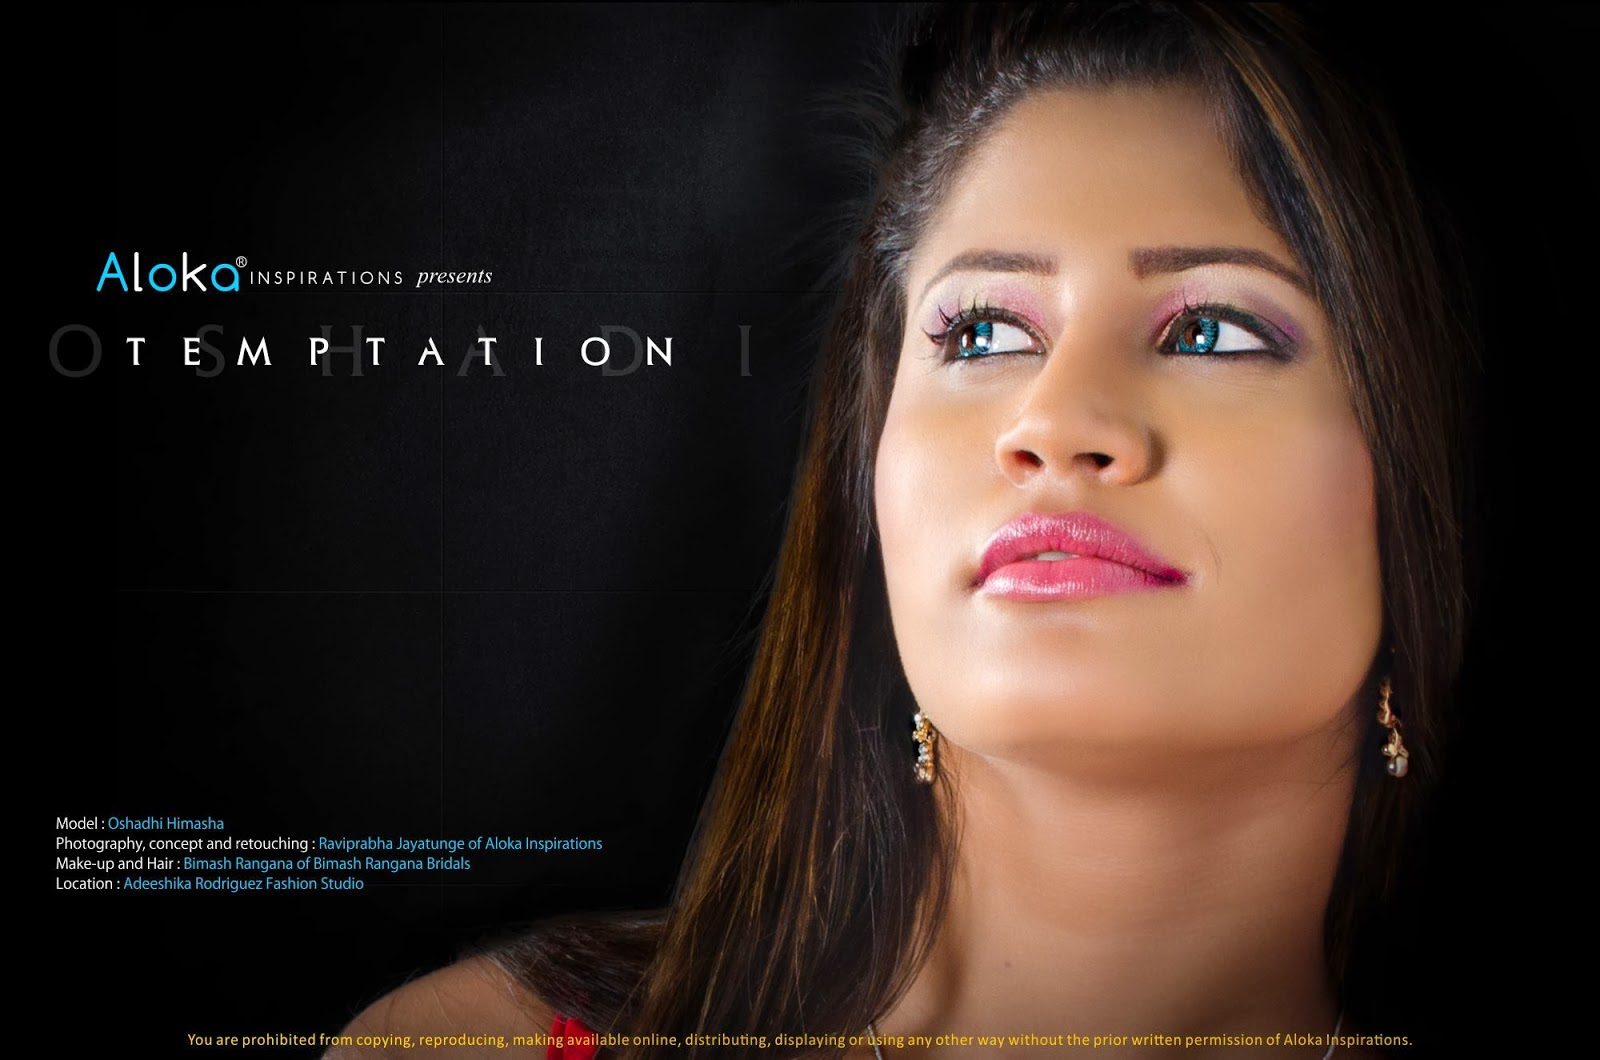 Oshadi Himasha Chavindi TEMPTATION by Aloka Inspirations